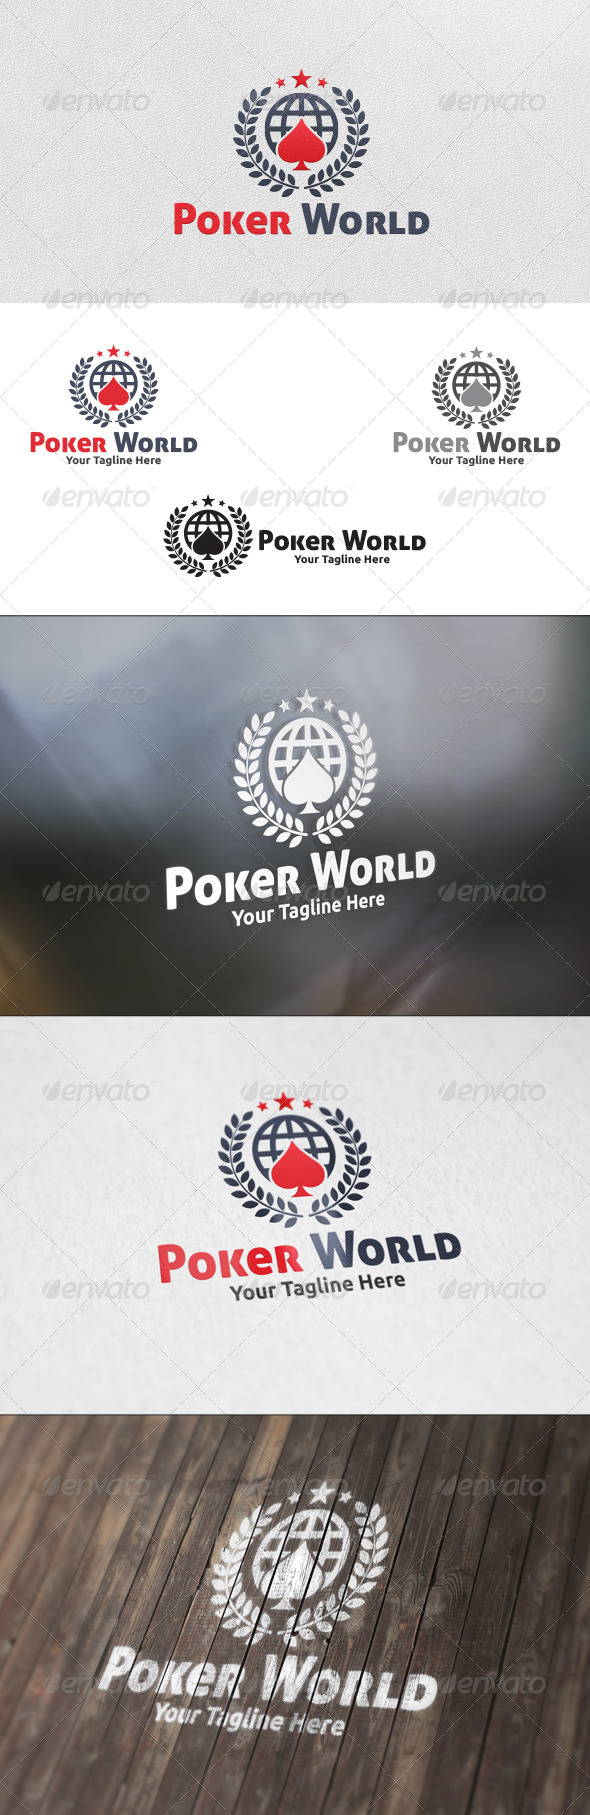 GraphicRiver Poker World Logo Template 5831369